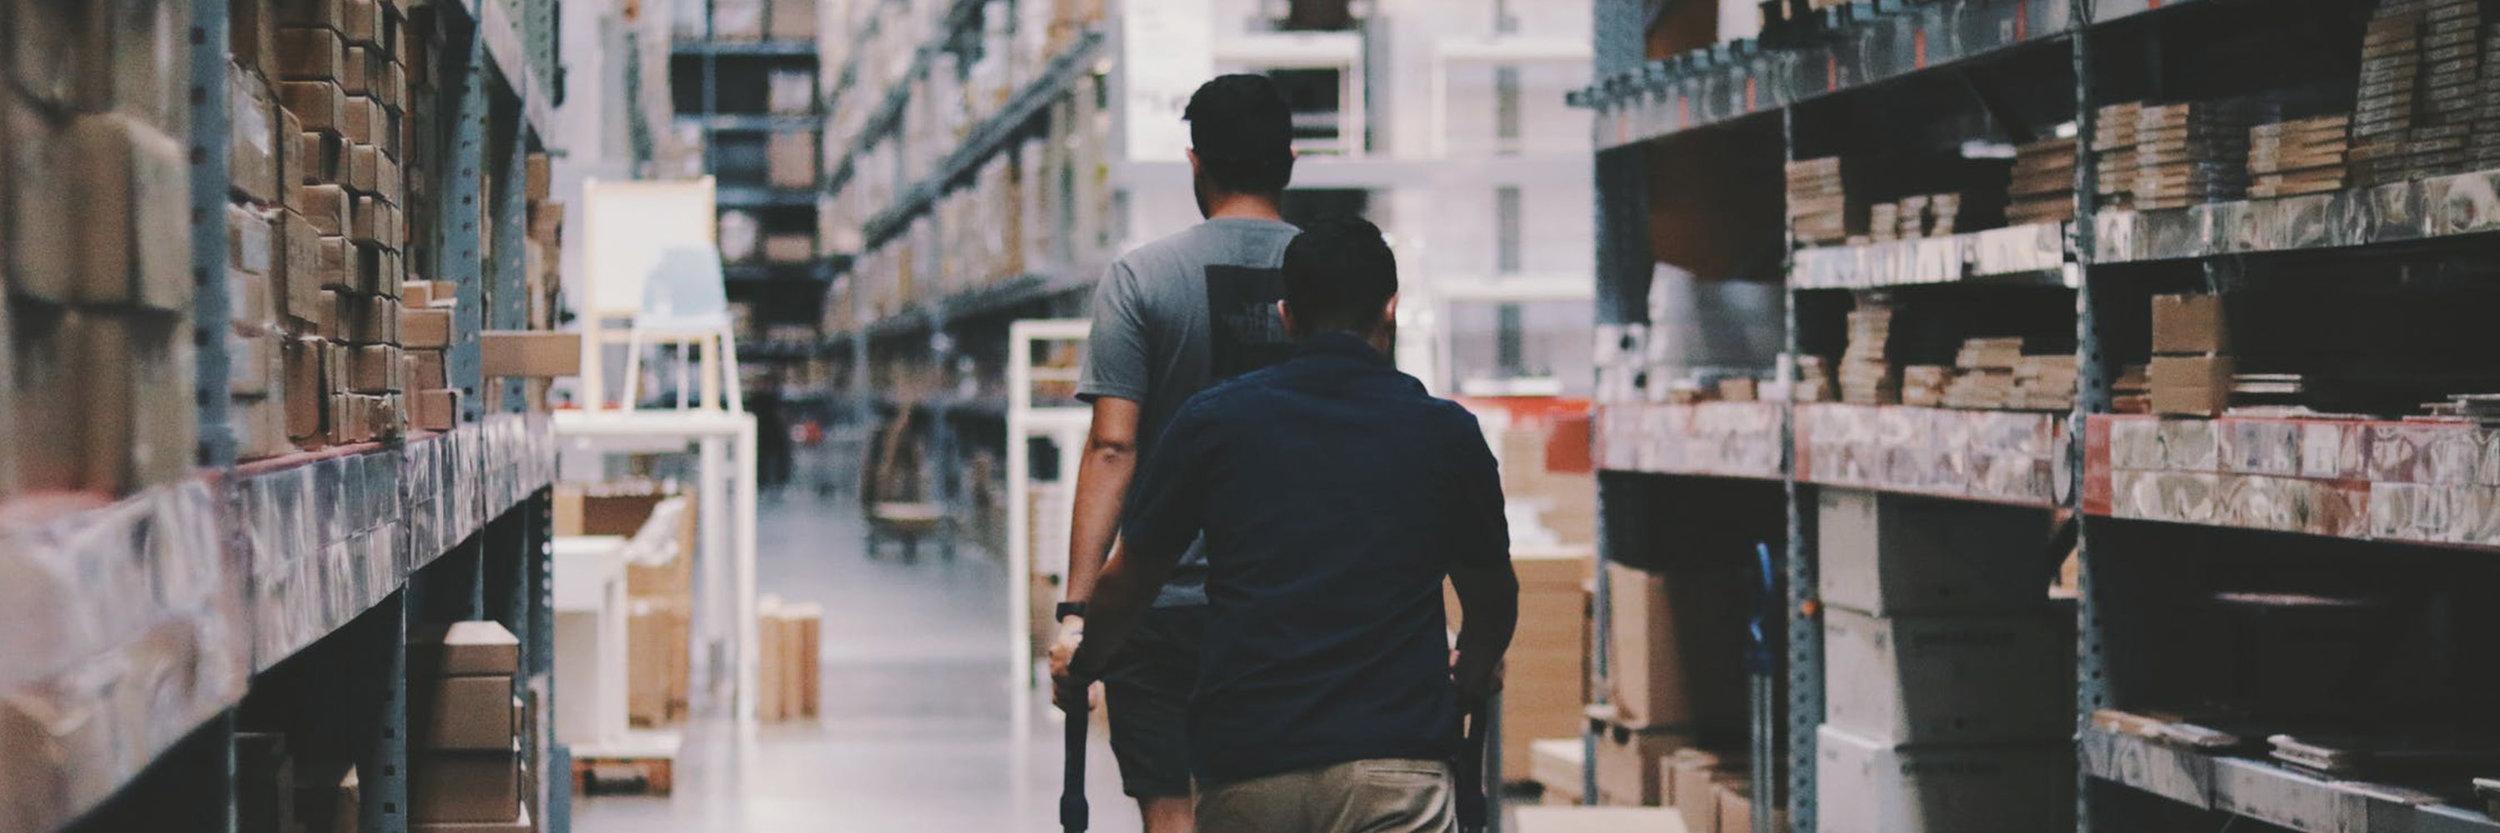 warehouse-02.jpg